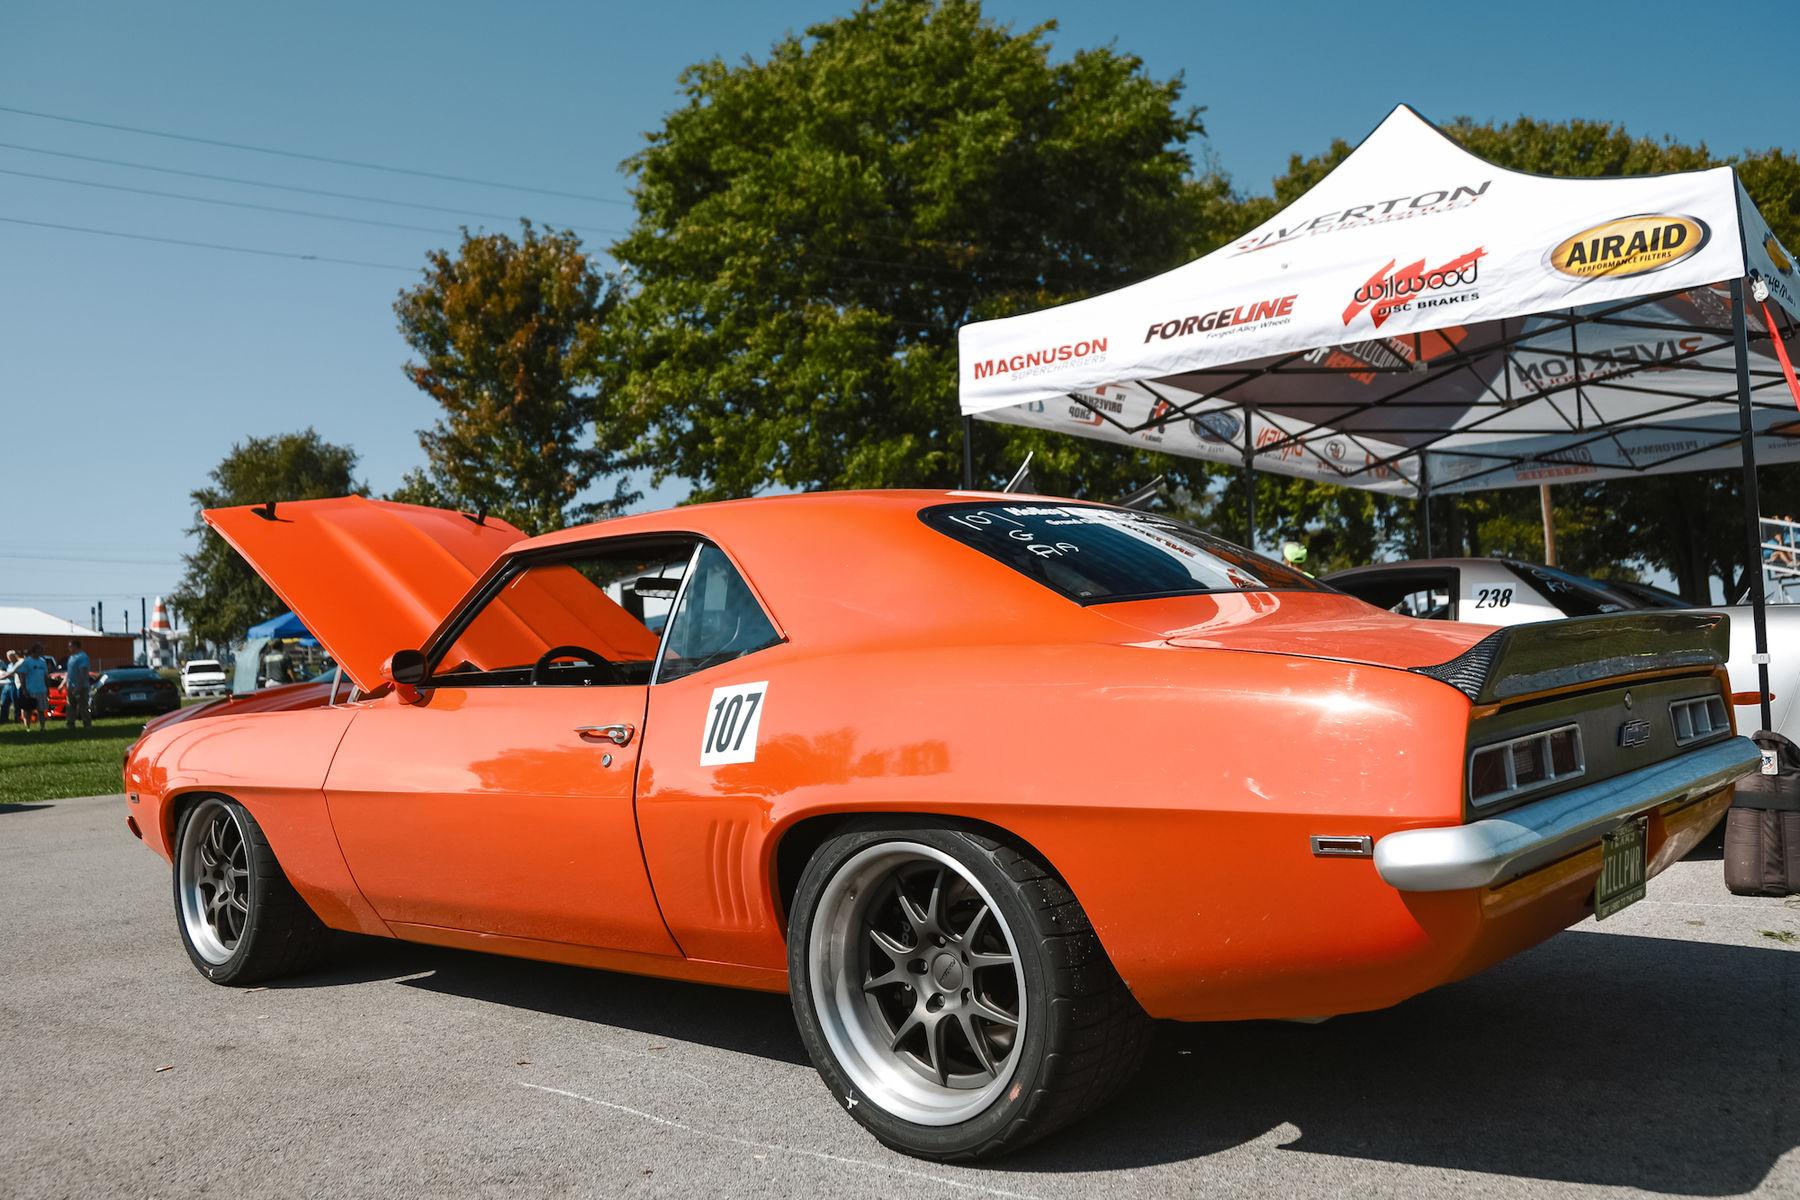 1969 Chevrolet Camaro   Will Hodge's Twin Turbo '69 Camaro on Forgeline GA3 Wheels